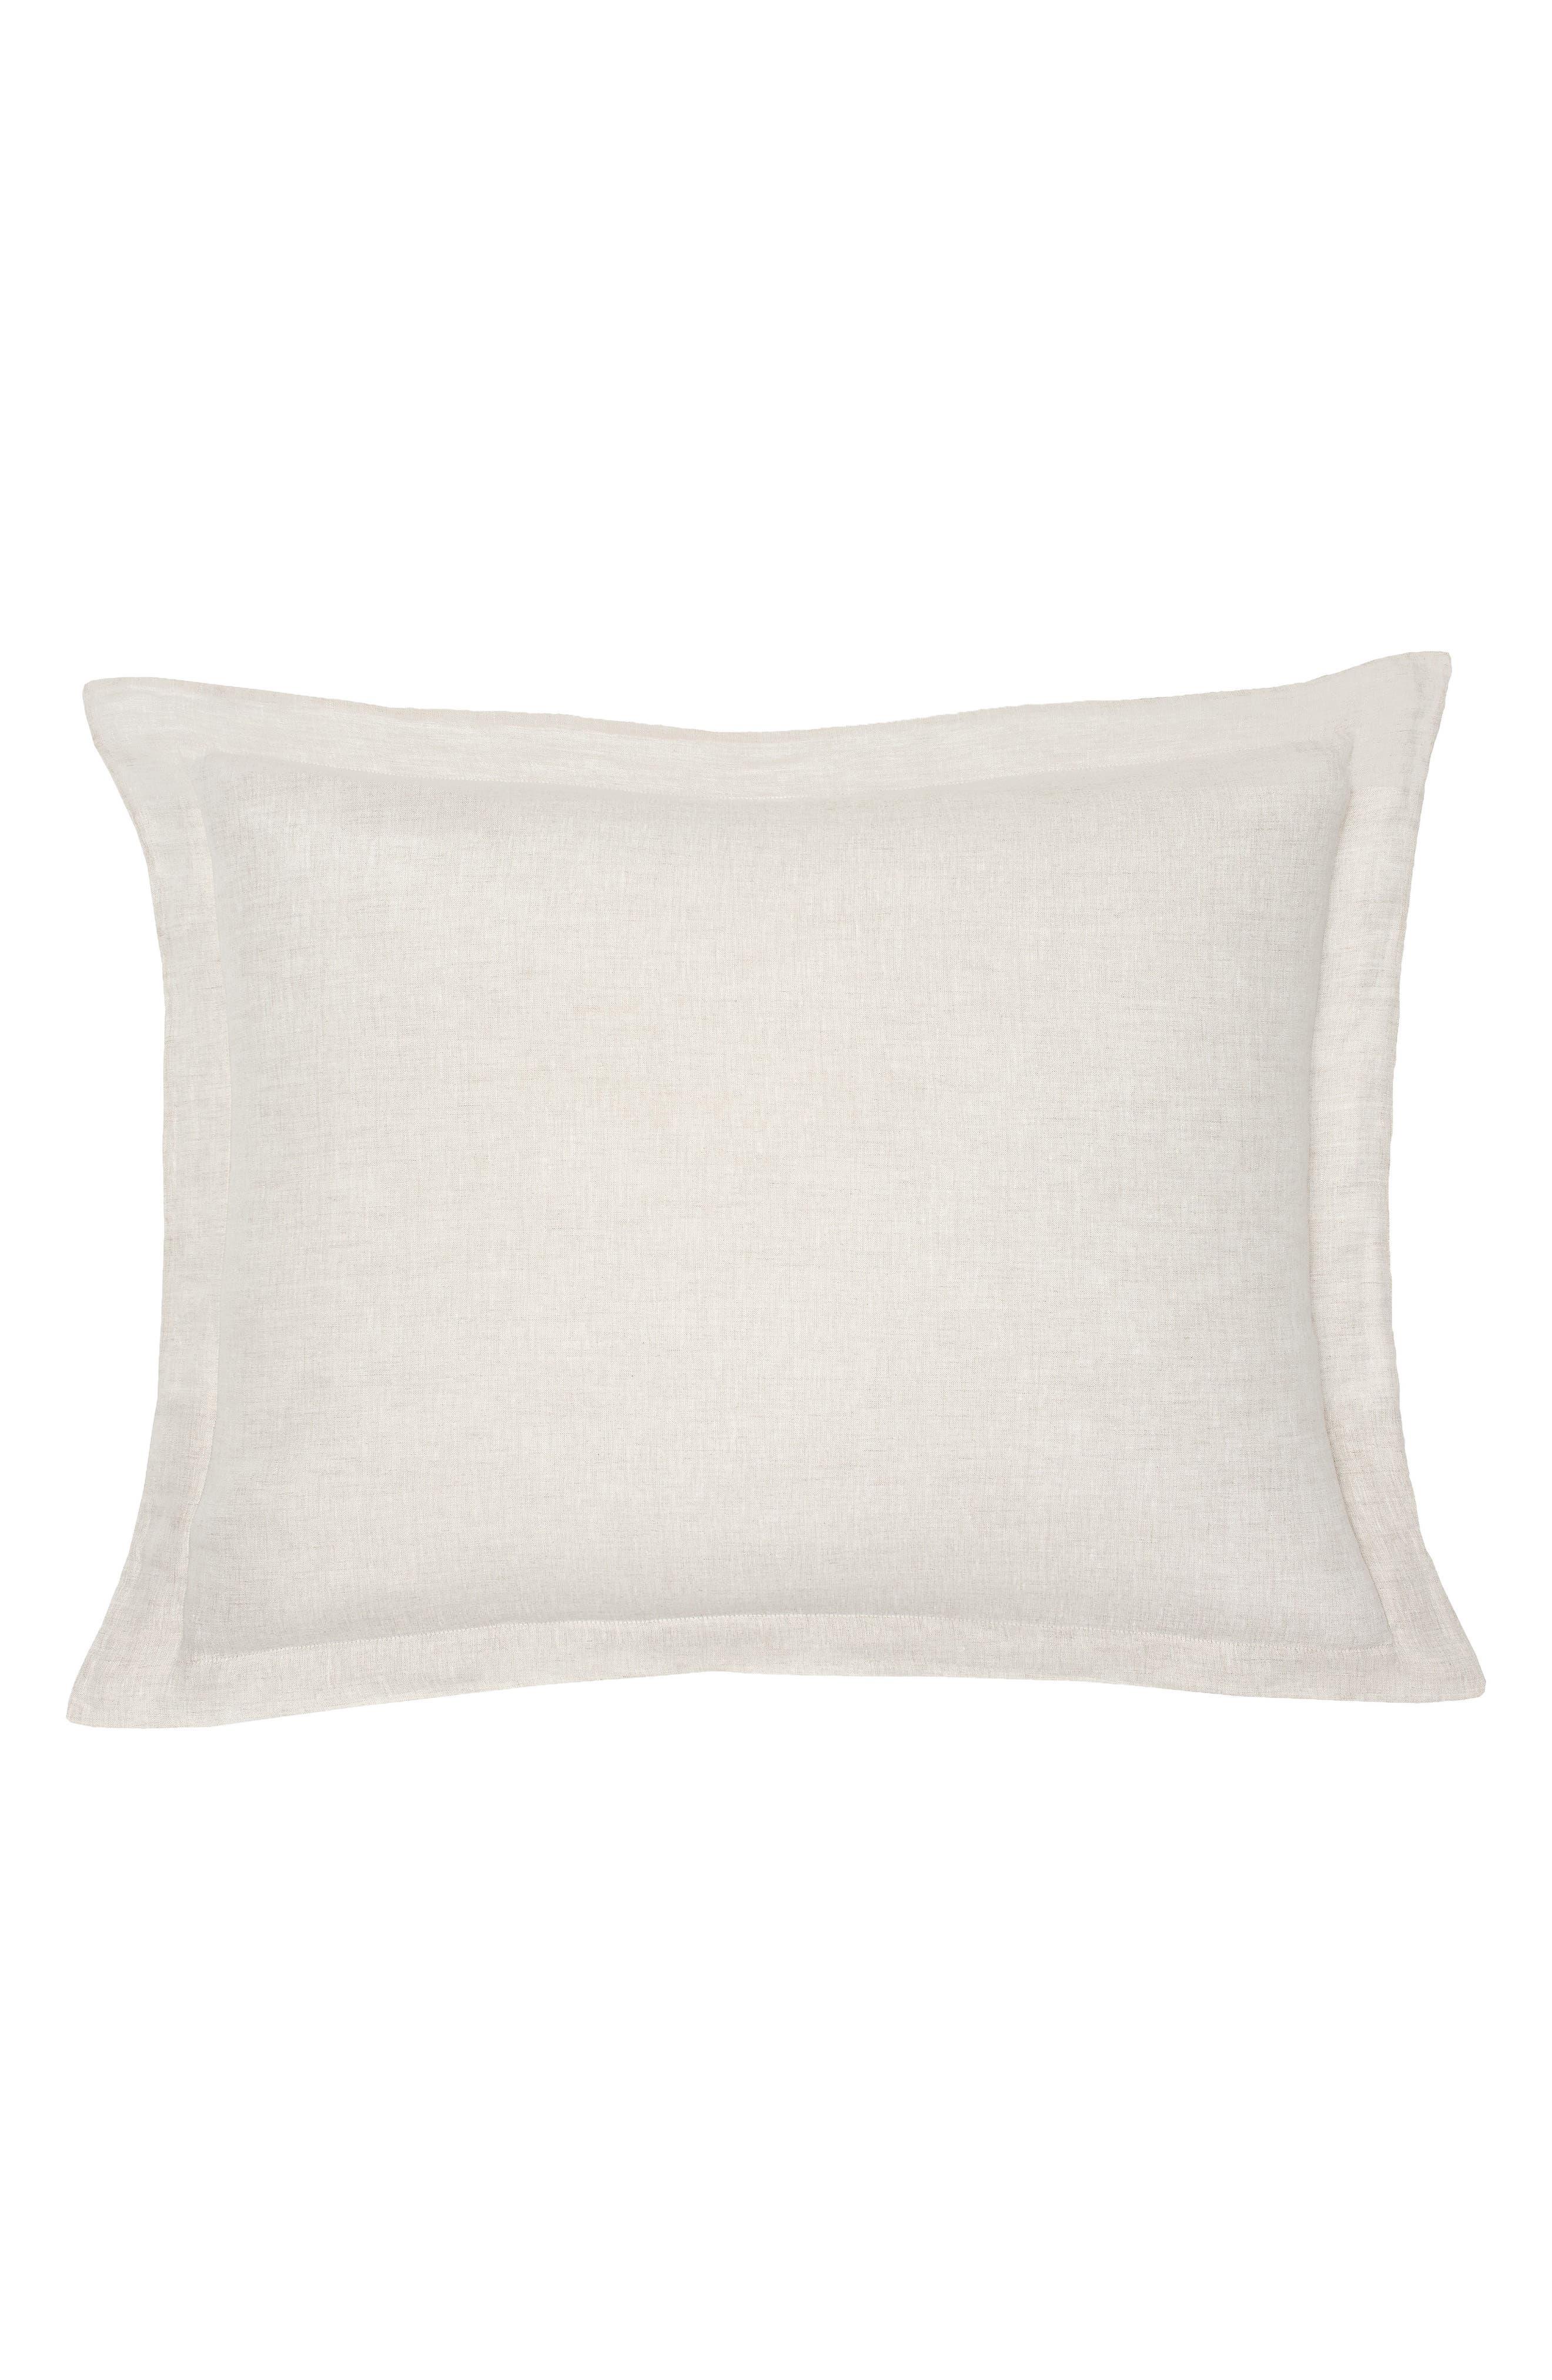 Lino Linen Sham,                         Main,                         color, Linen